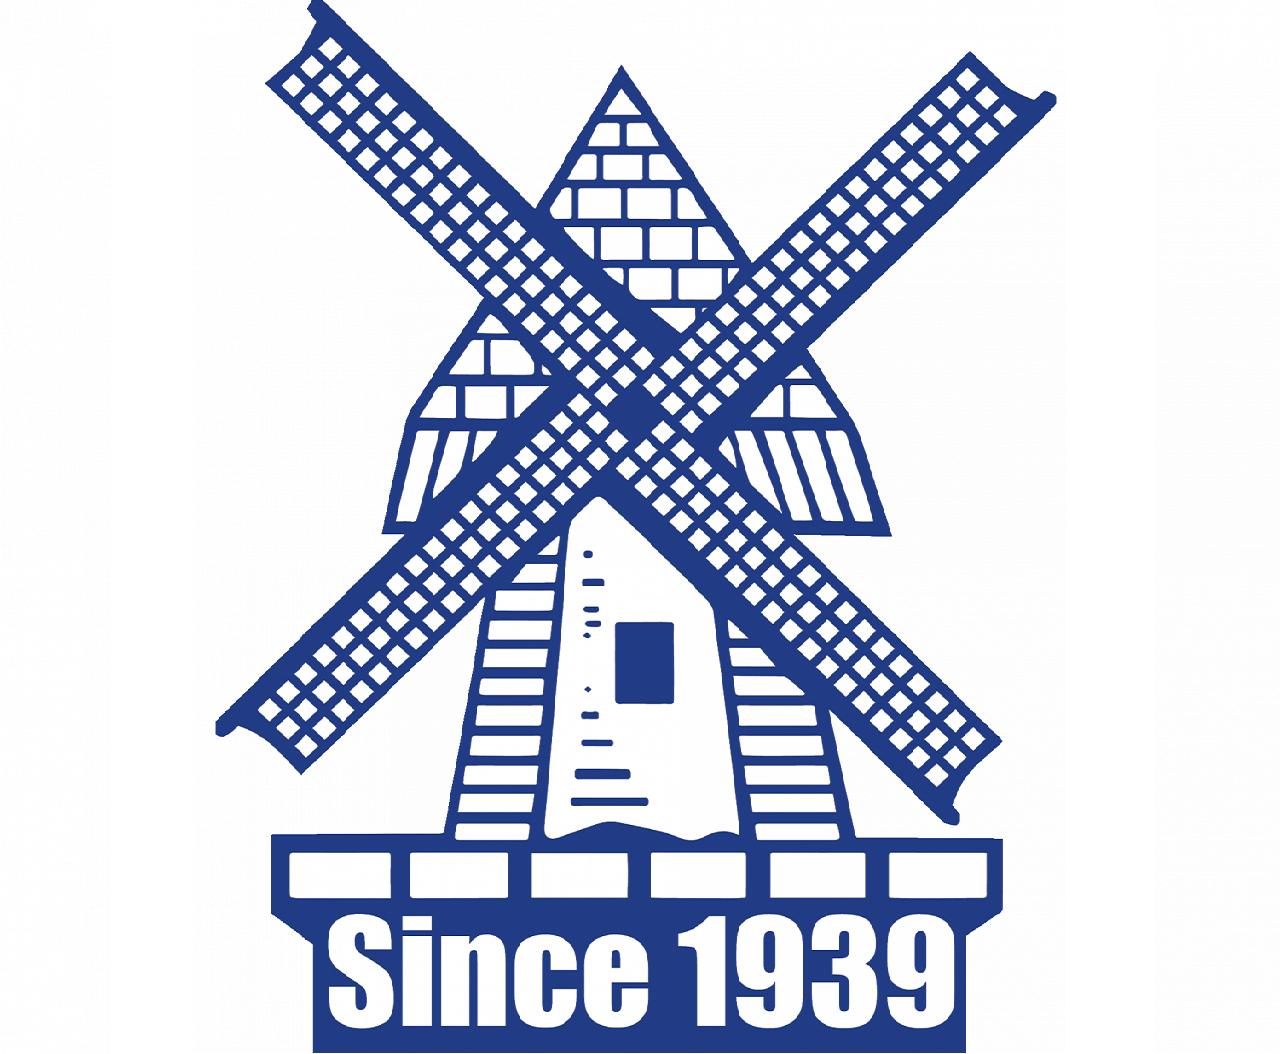 medium resolution of n14 celect cummins n14 celect price 6500 00